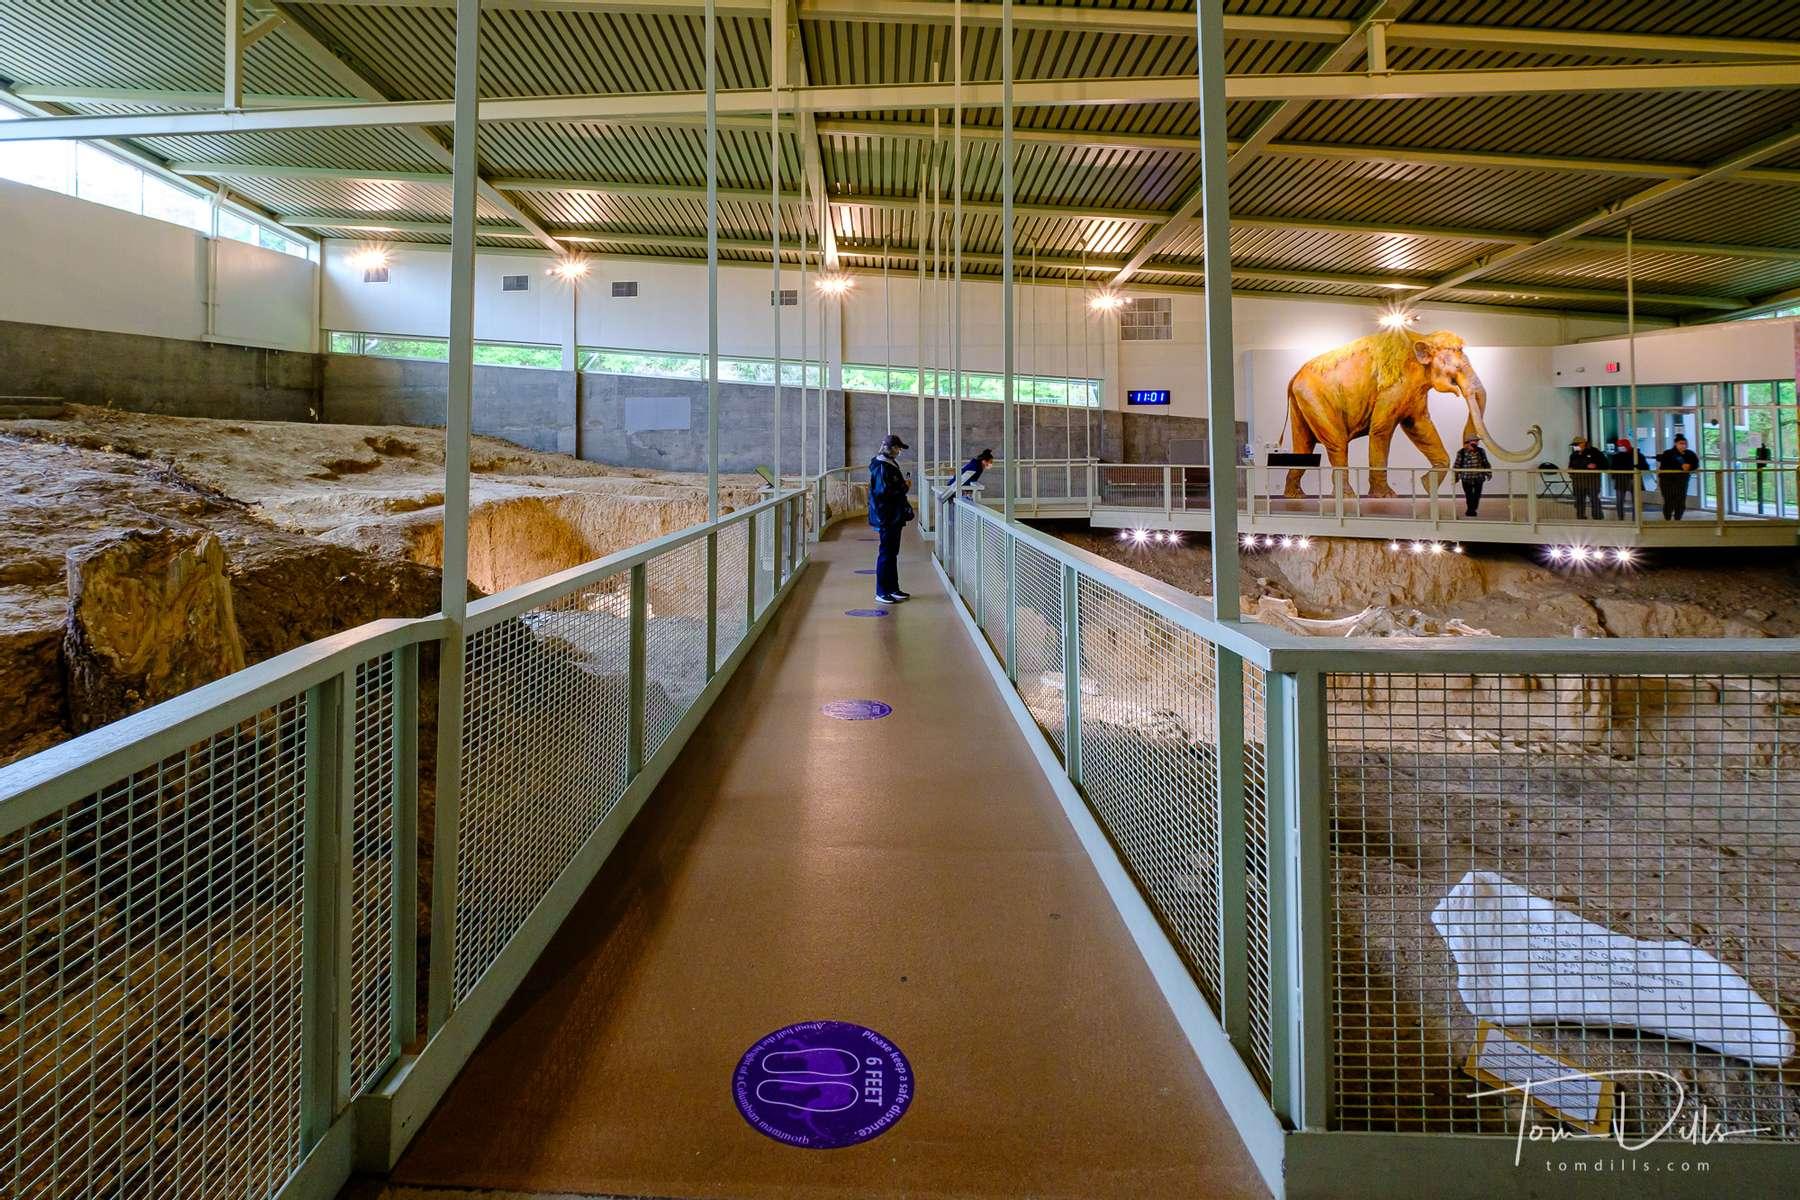 Waco Mammoth National Monument in Waco, Texas